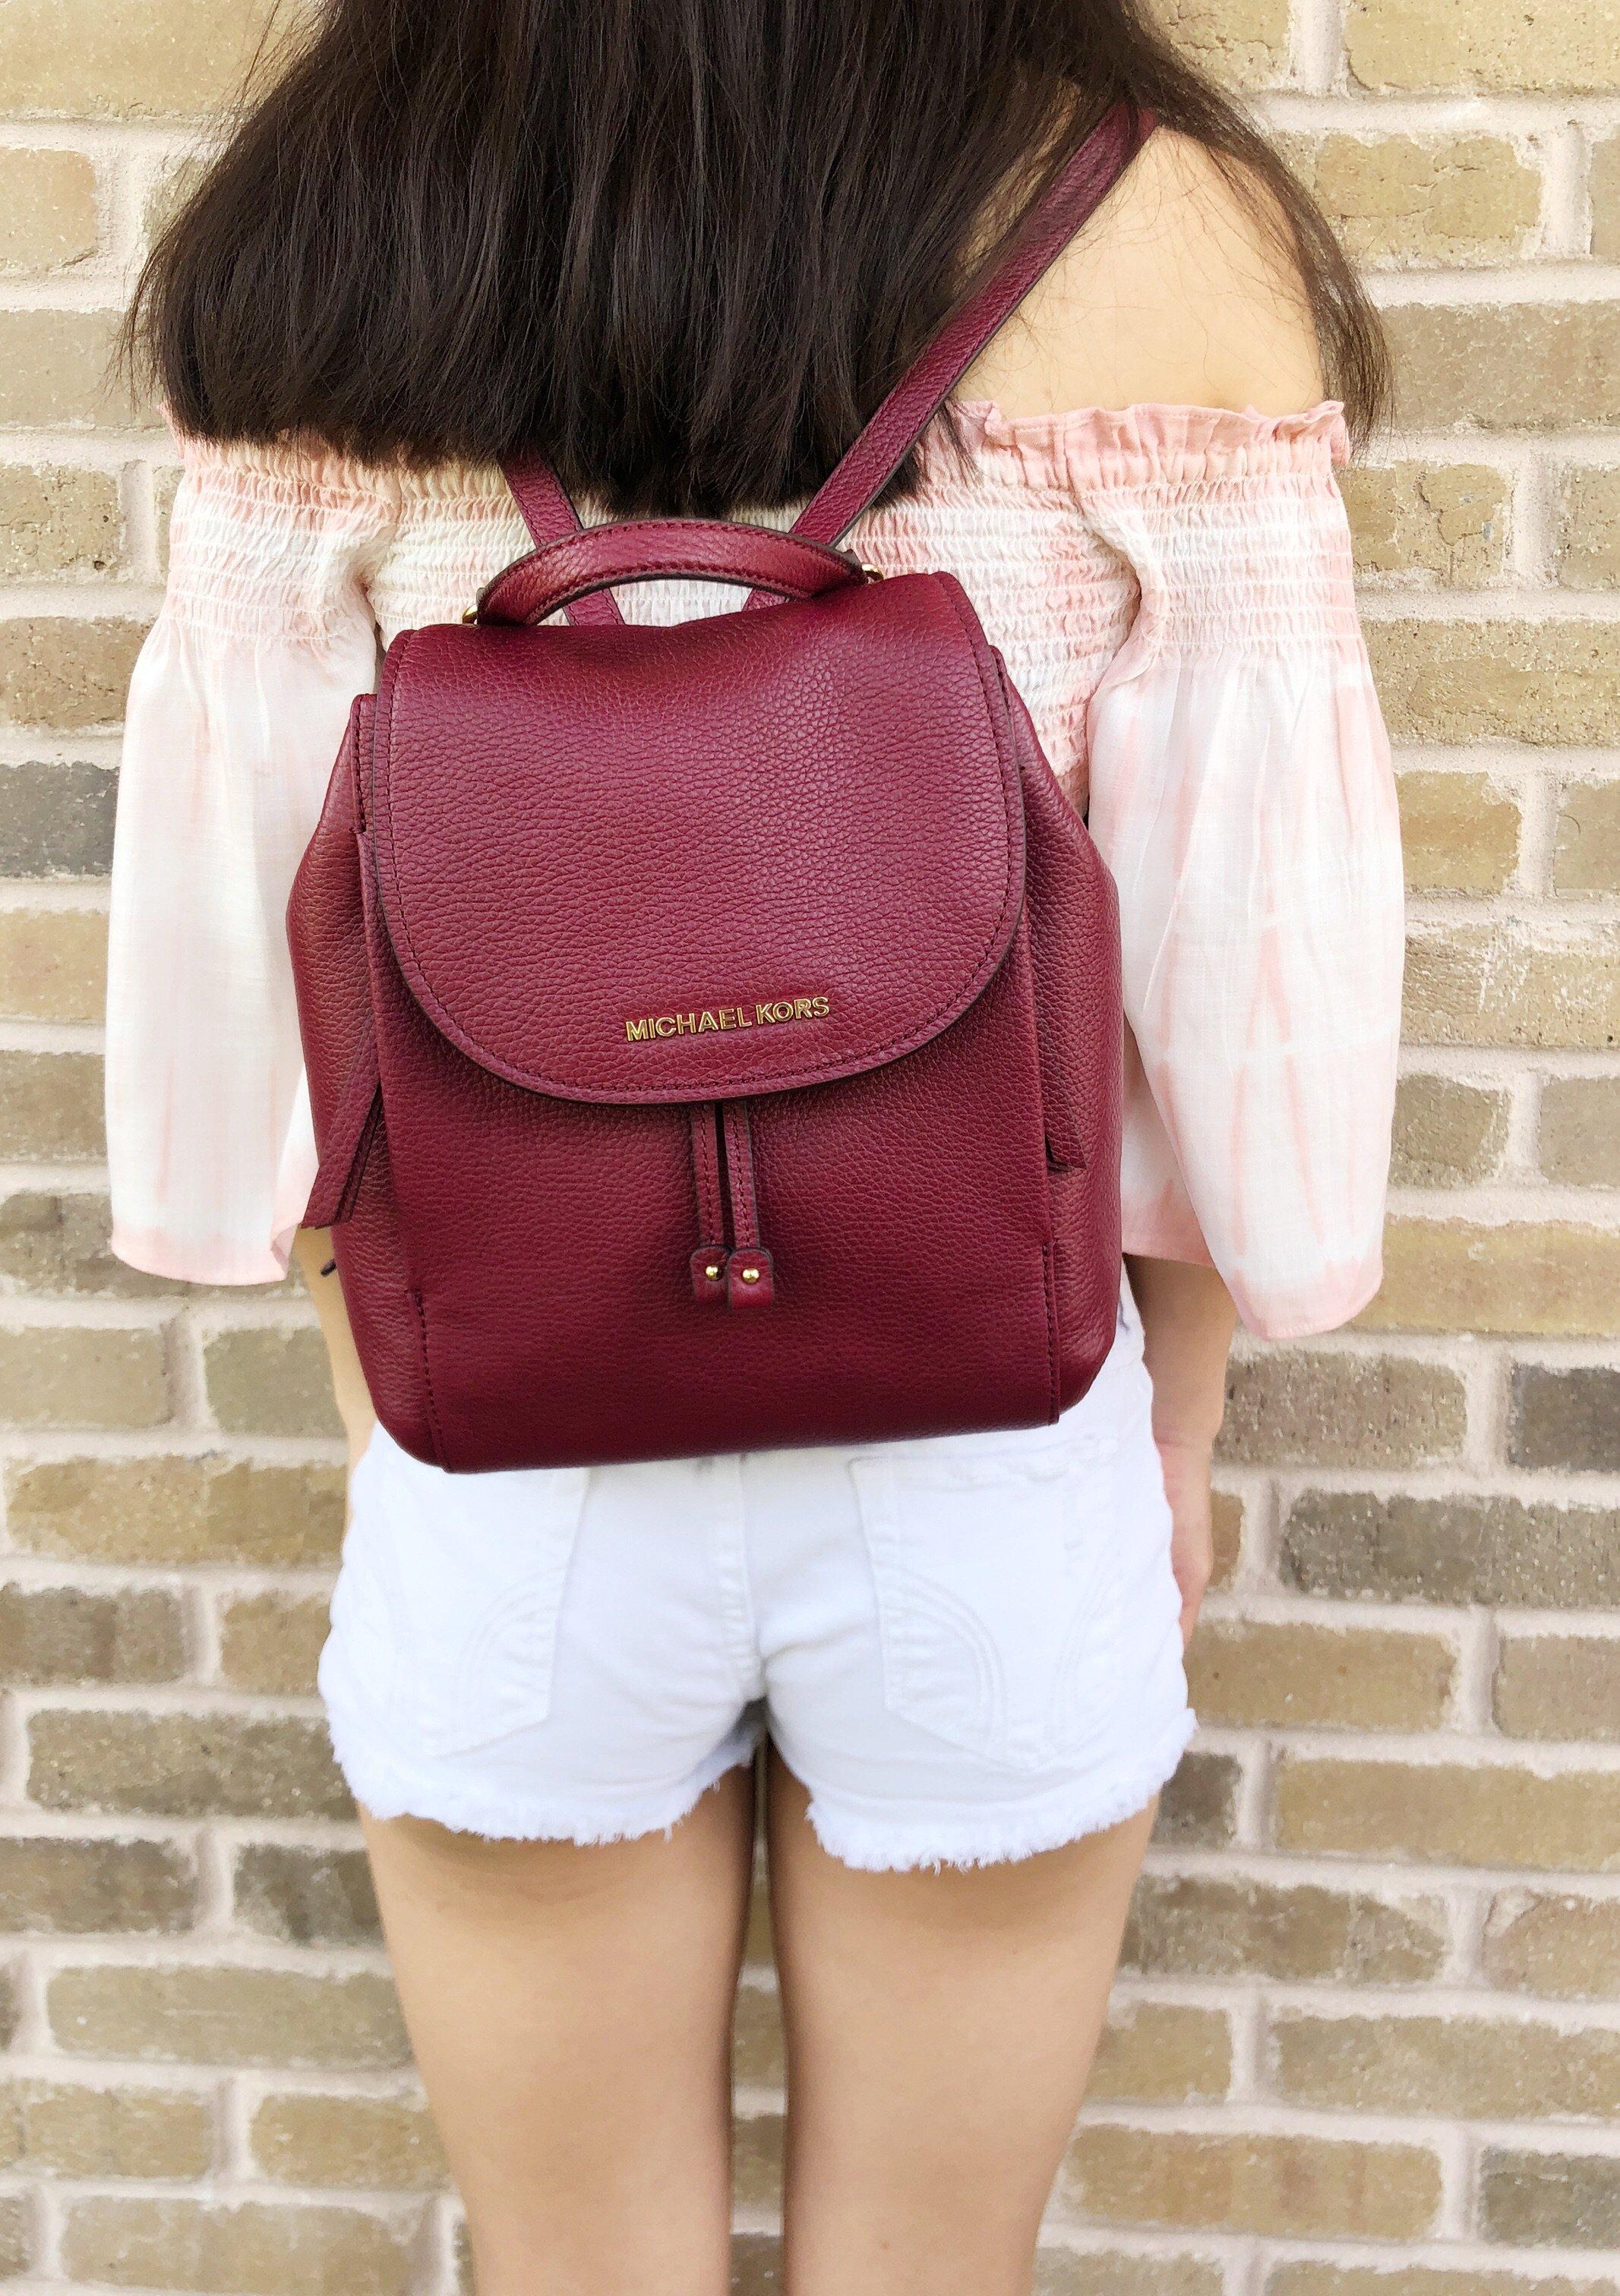 7f37e3a708 Michael Kors Riley Medium Backpack Mulberry Burgundy Drawstring Flap ...